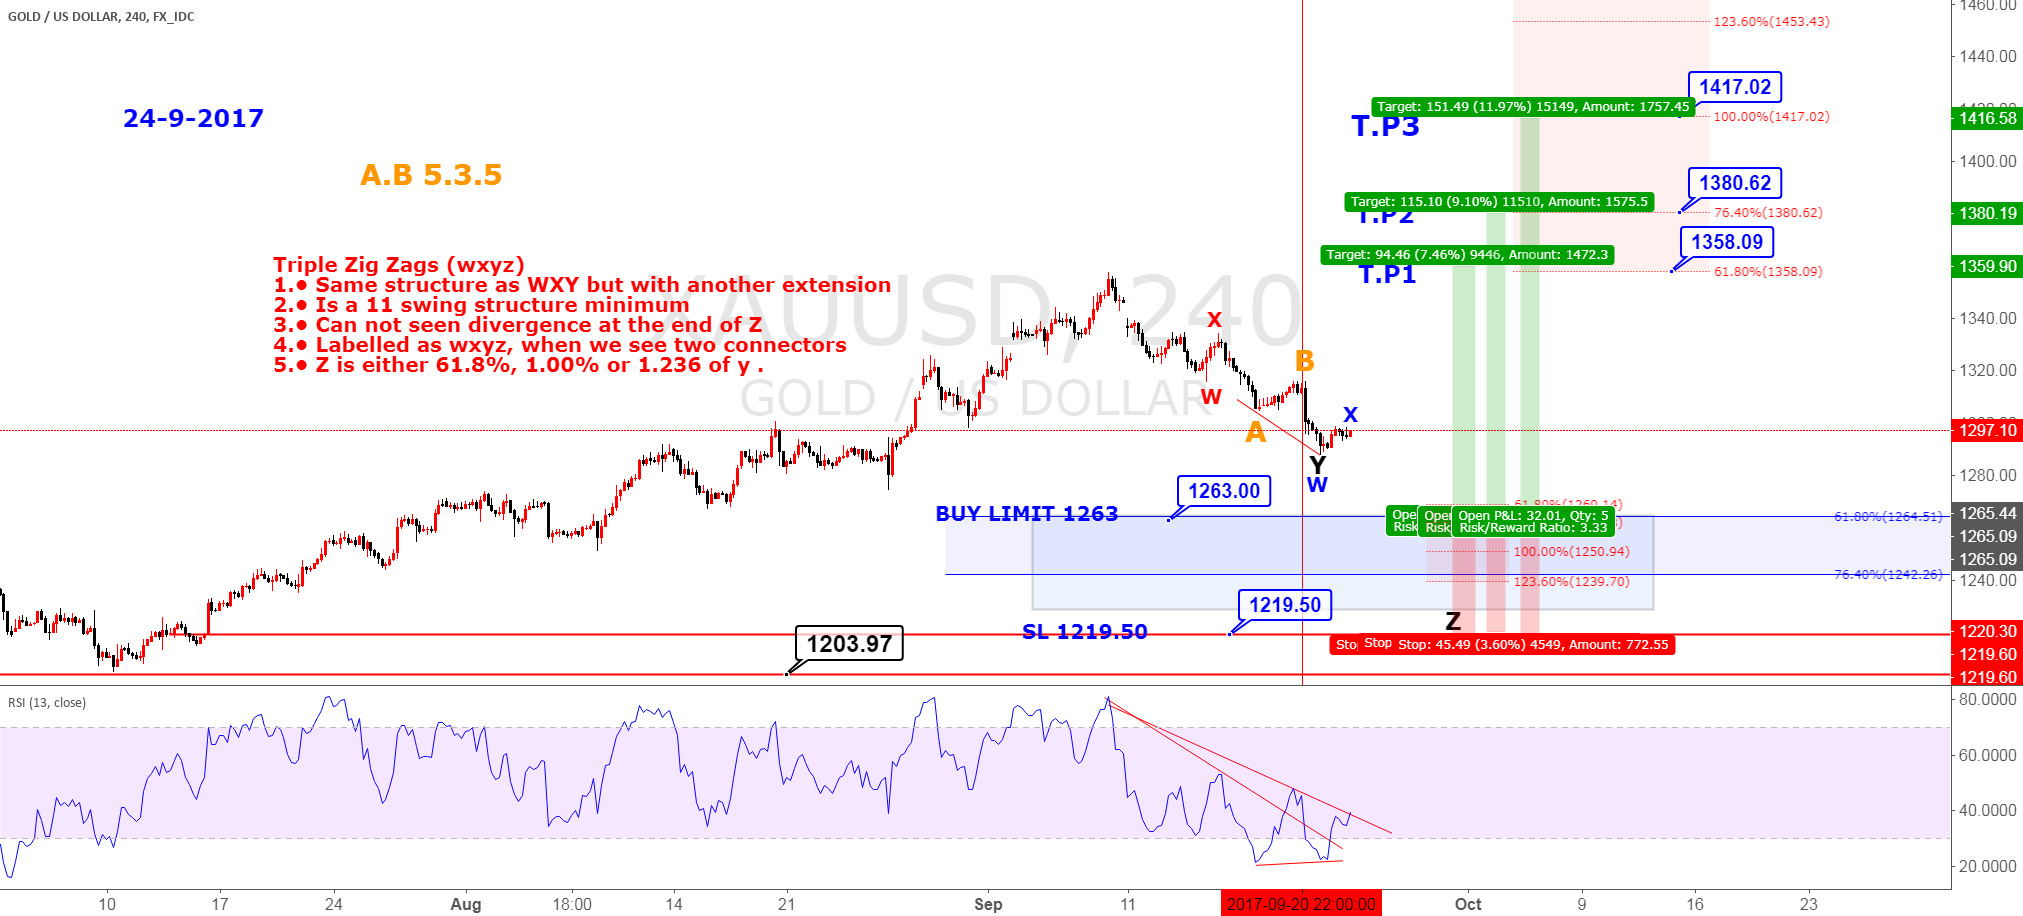 XAUUSD Elliot wave analysis buy limit